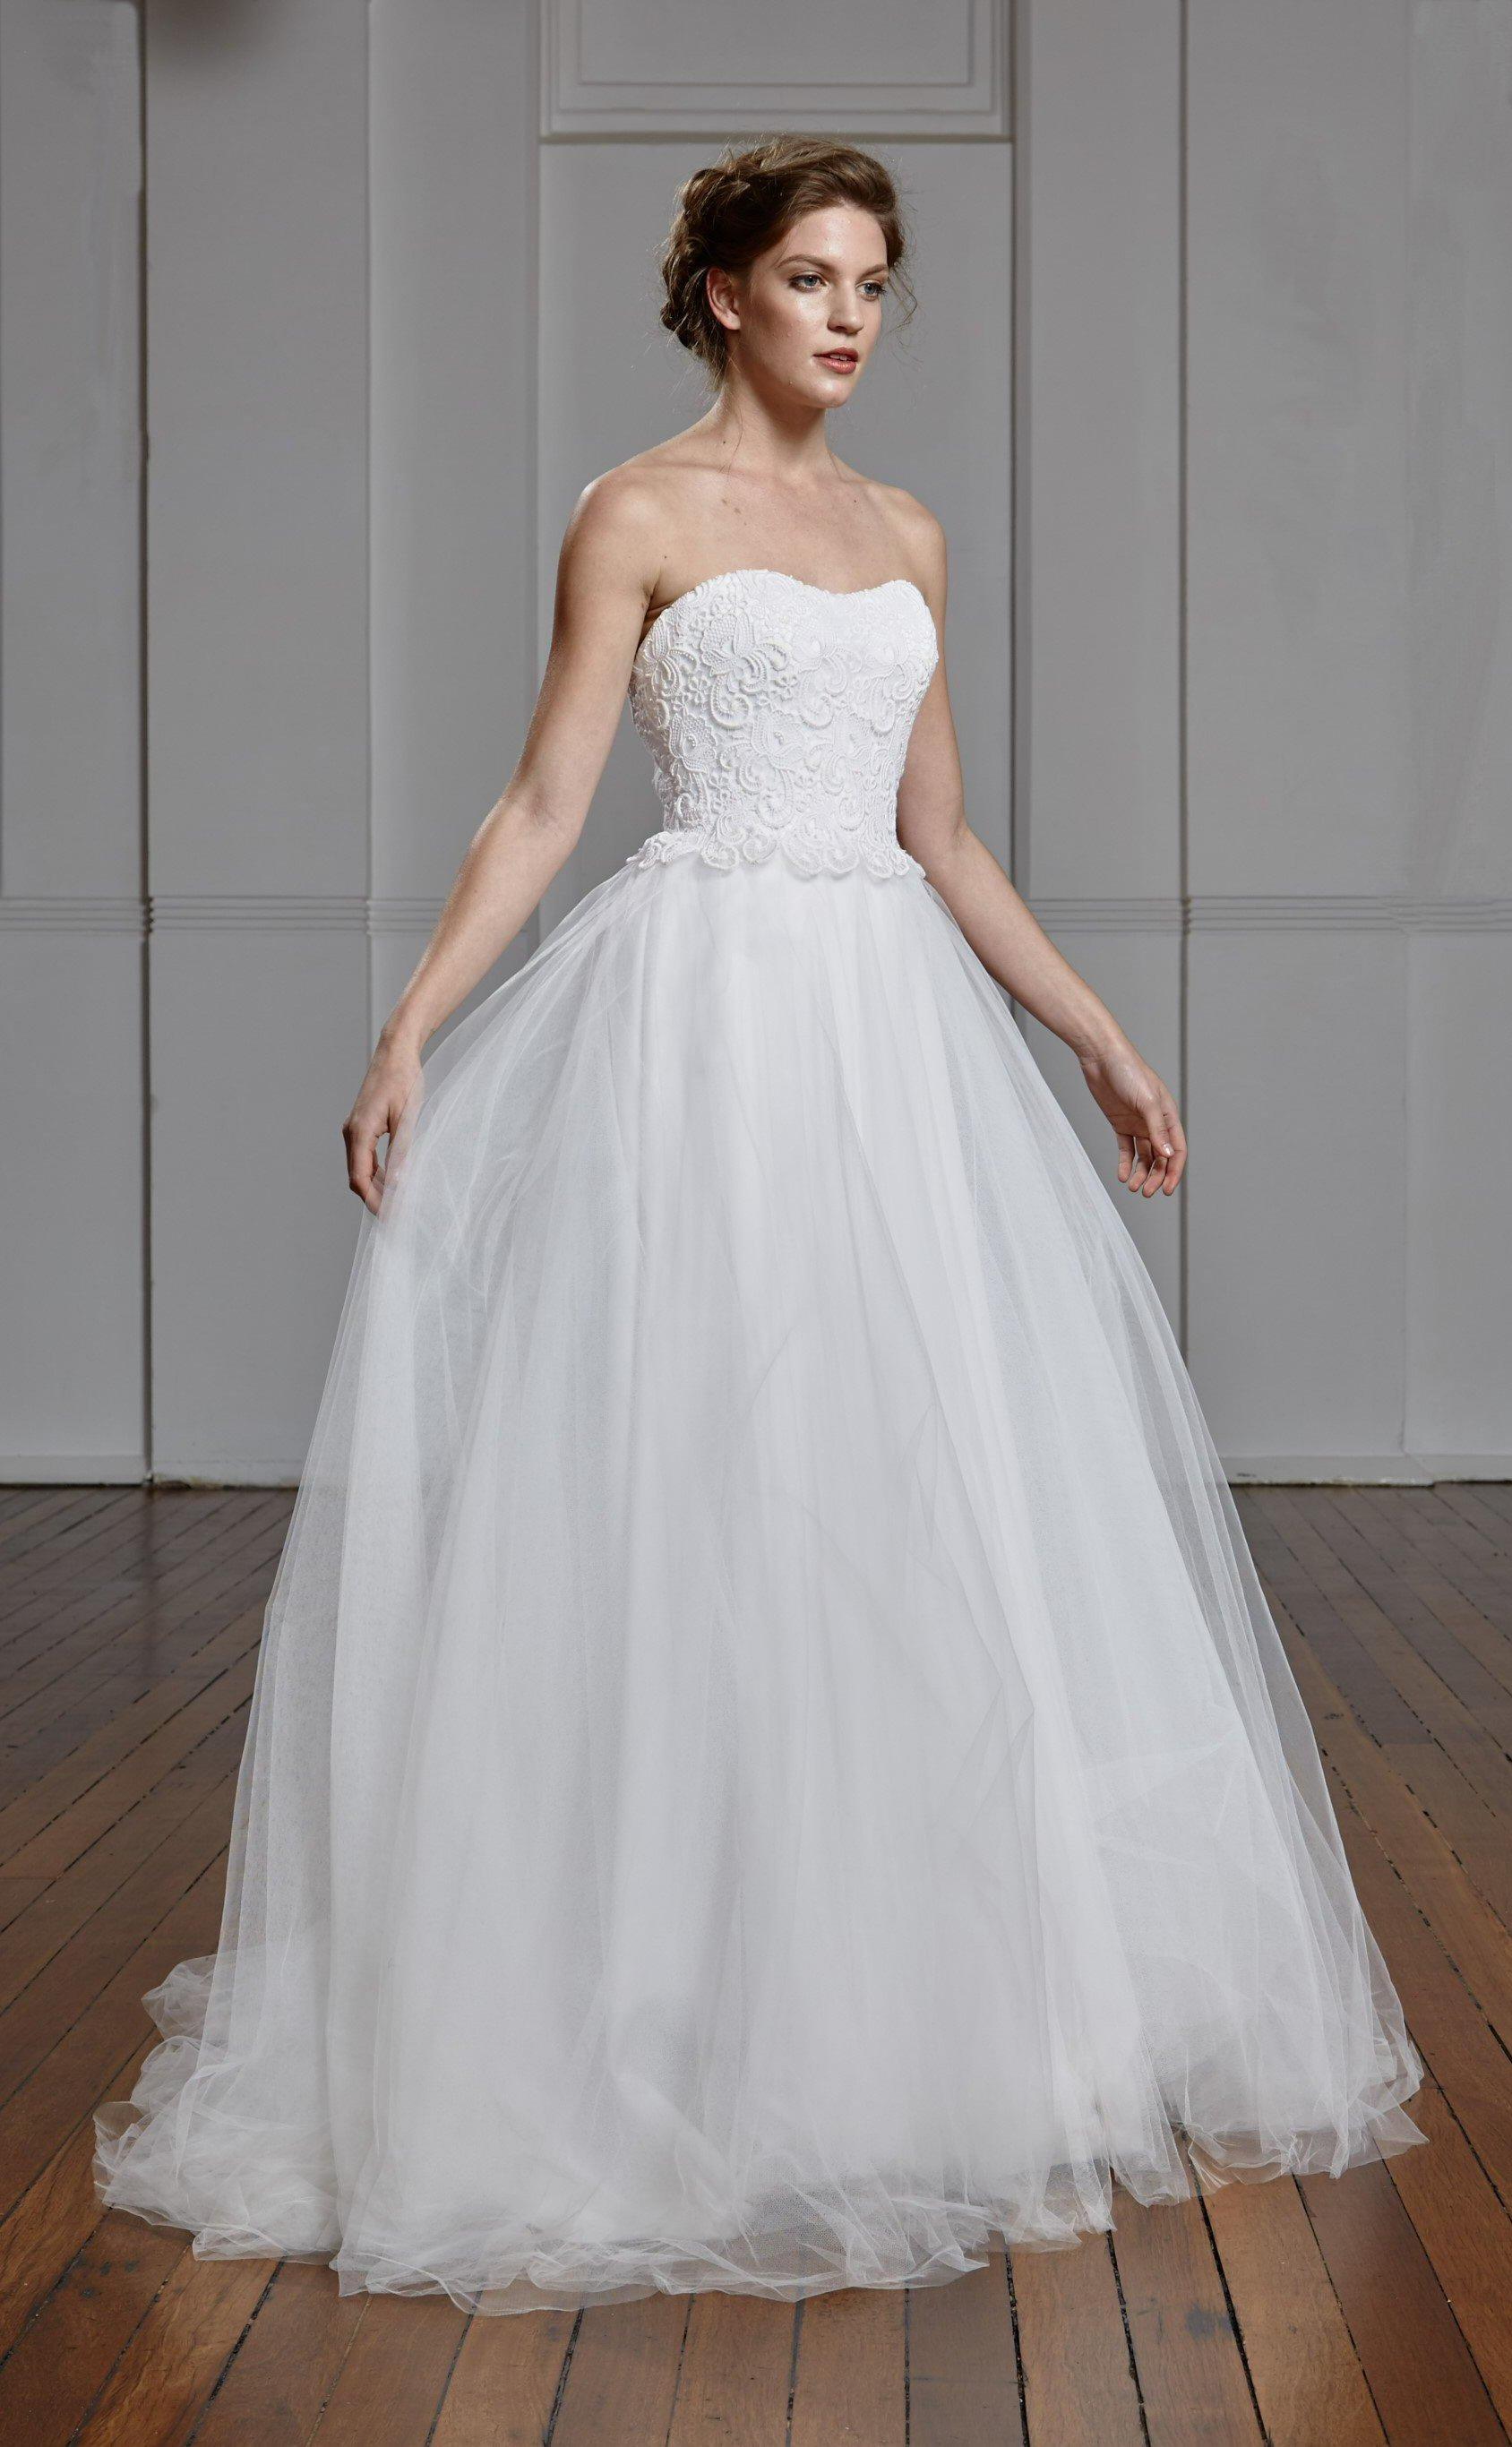 Rose summer bridal gown Tanya Anic Bridal photographyGrant Sparkes Carroll double bay sydney bridal_170_.jpg